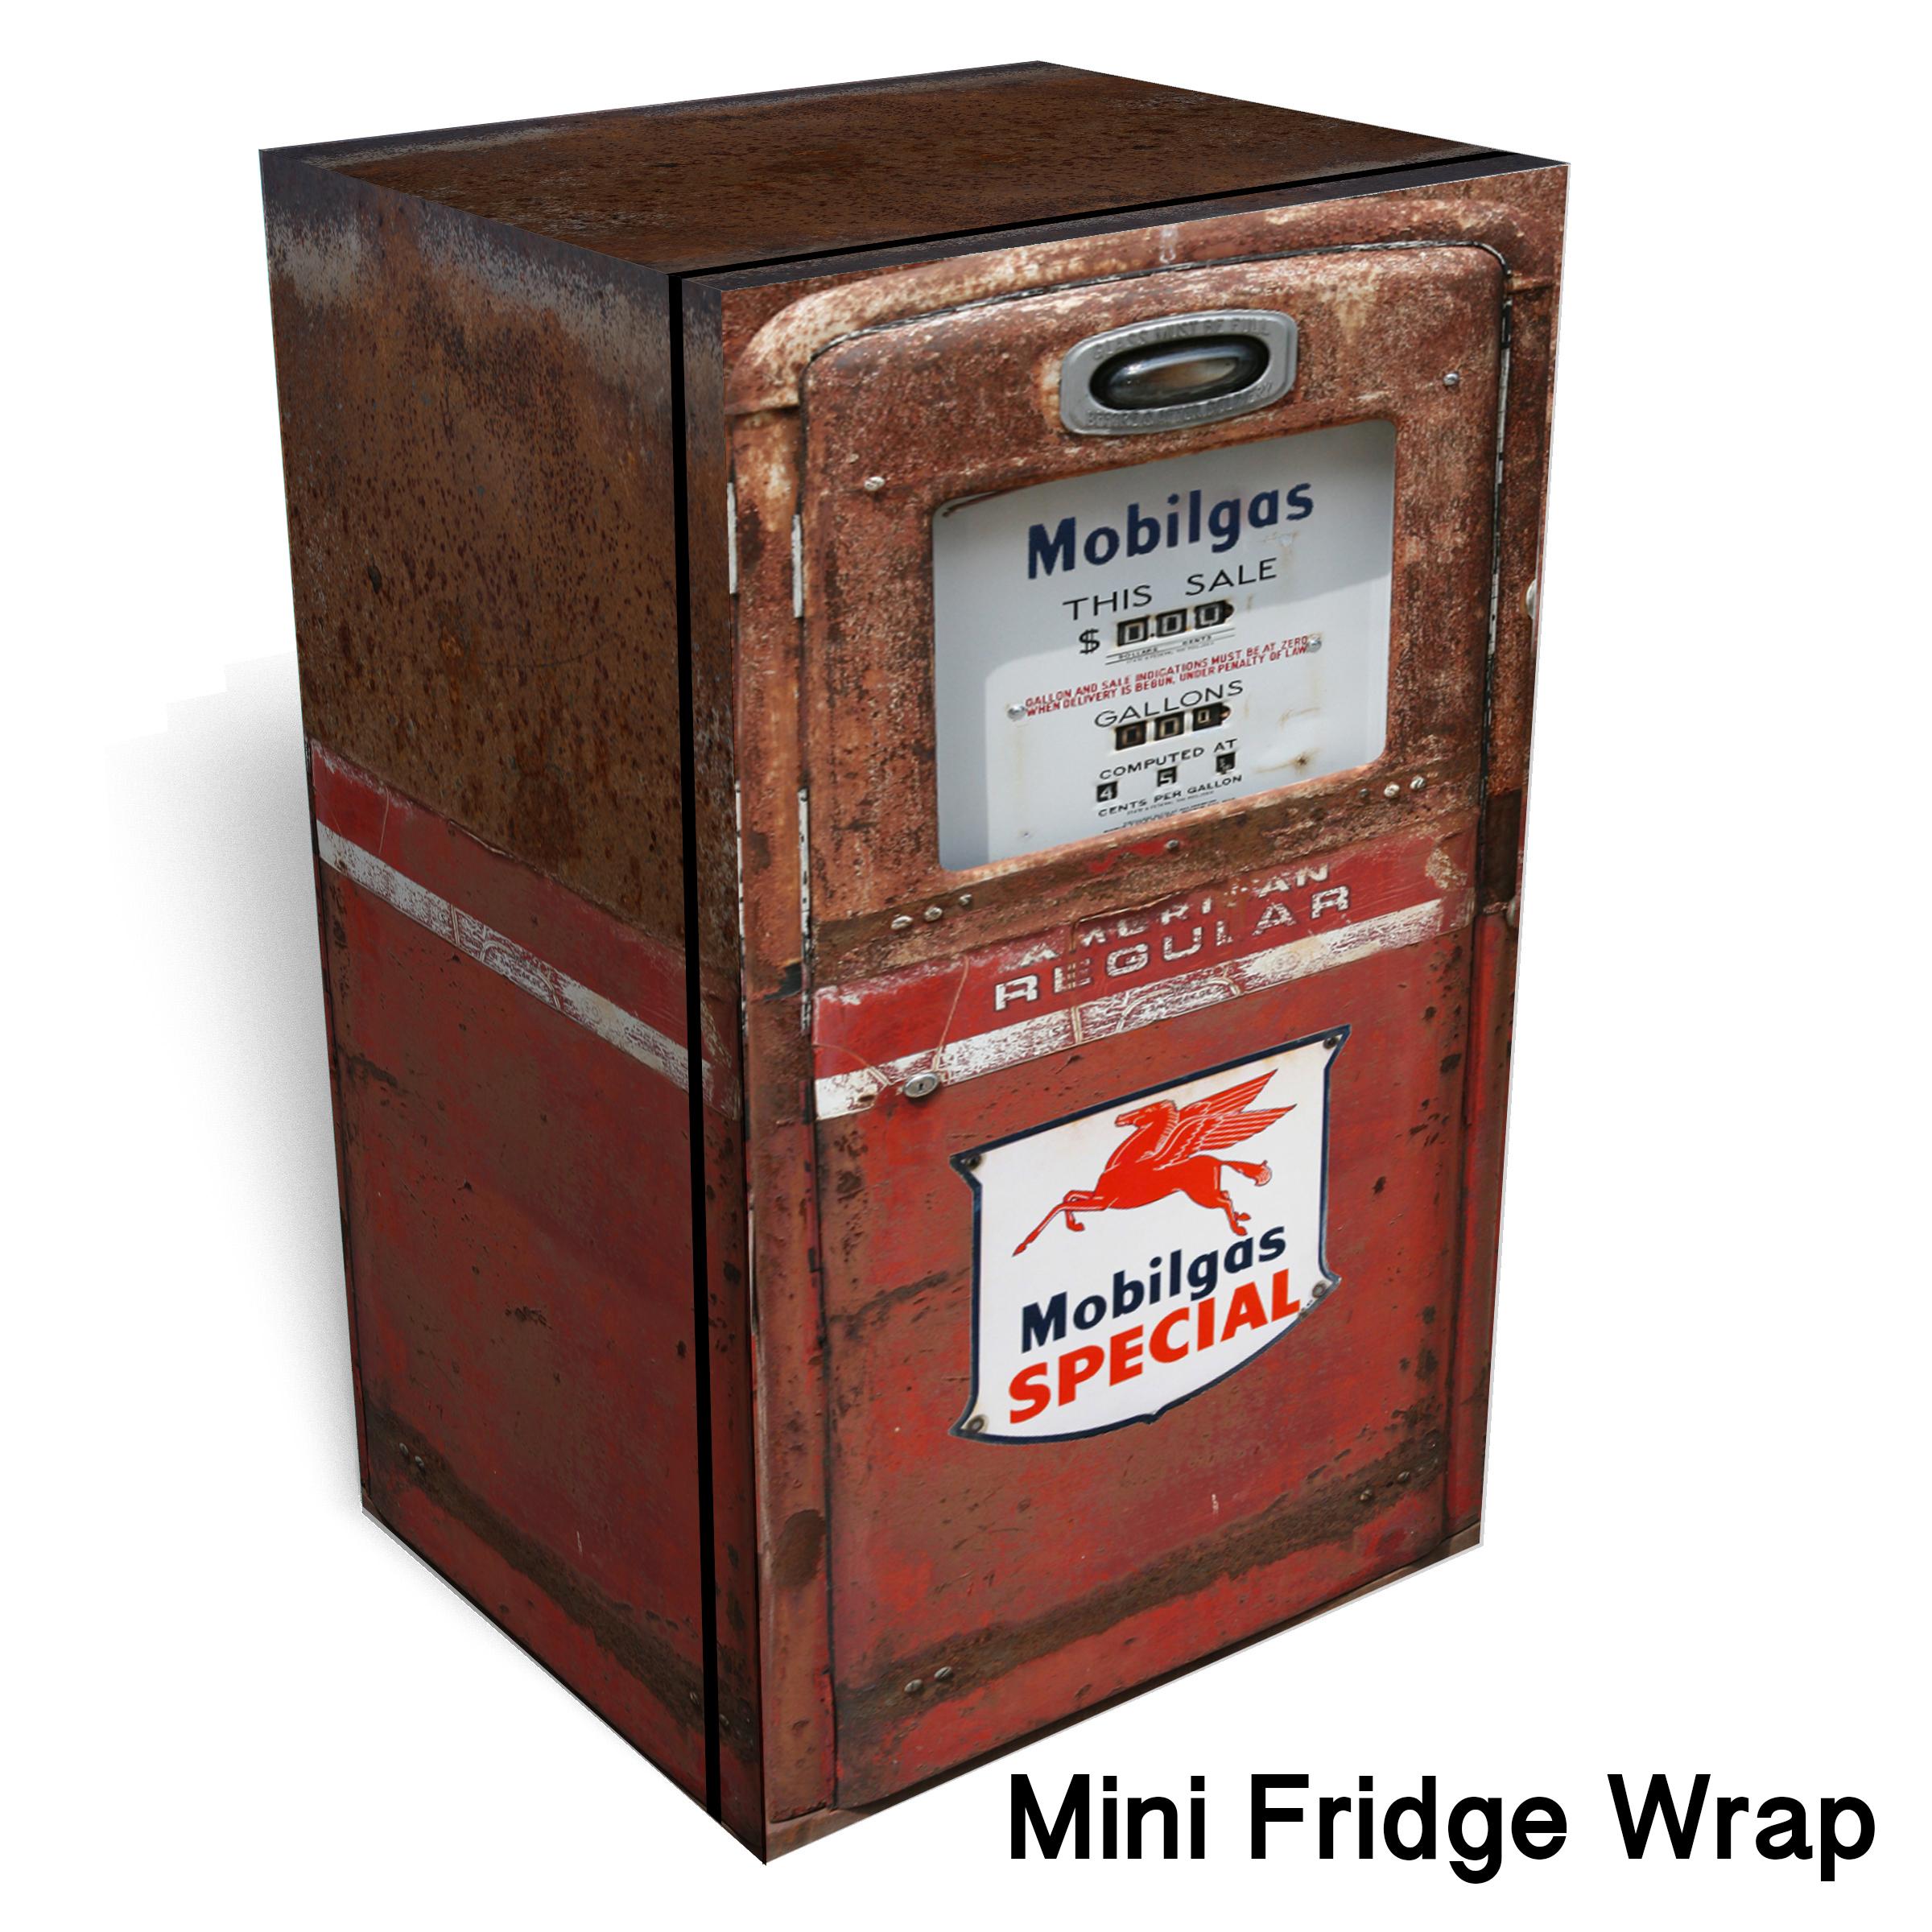 Mobilgas red Rust Mini Fridge wrap